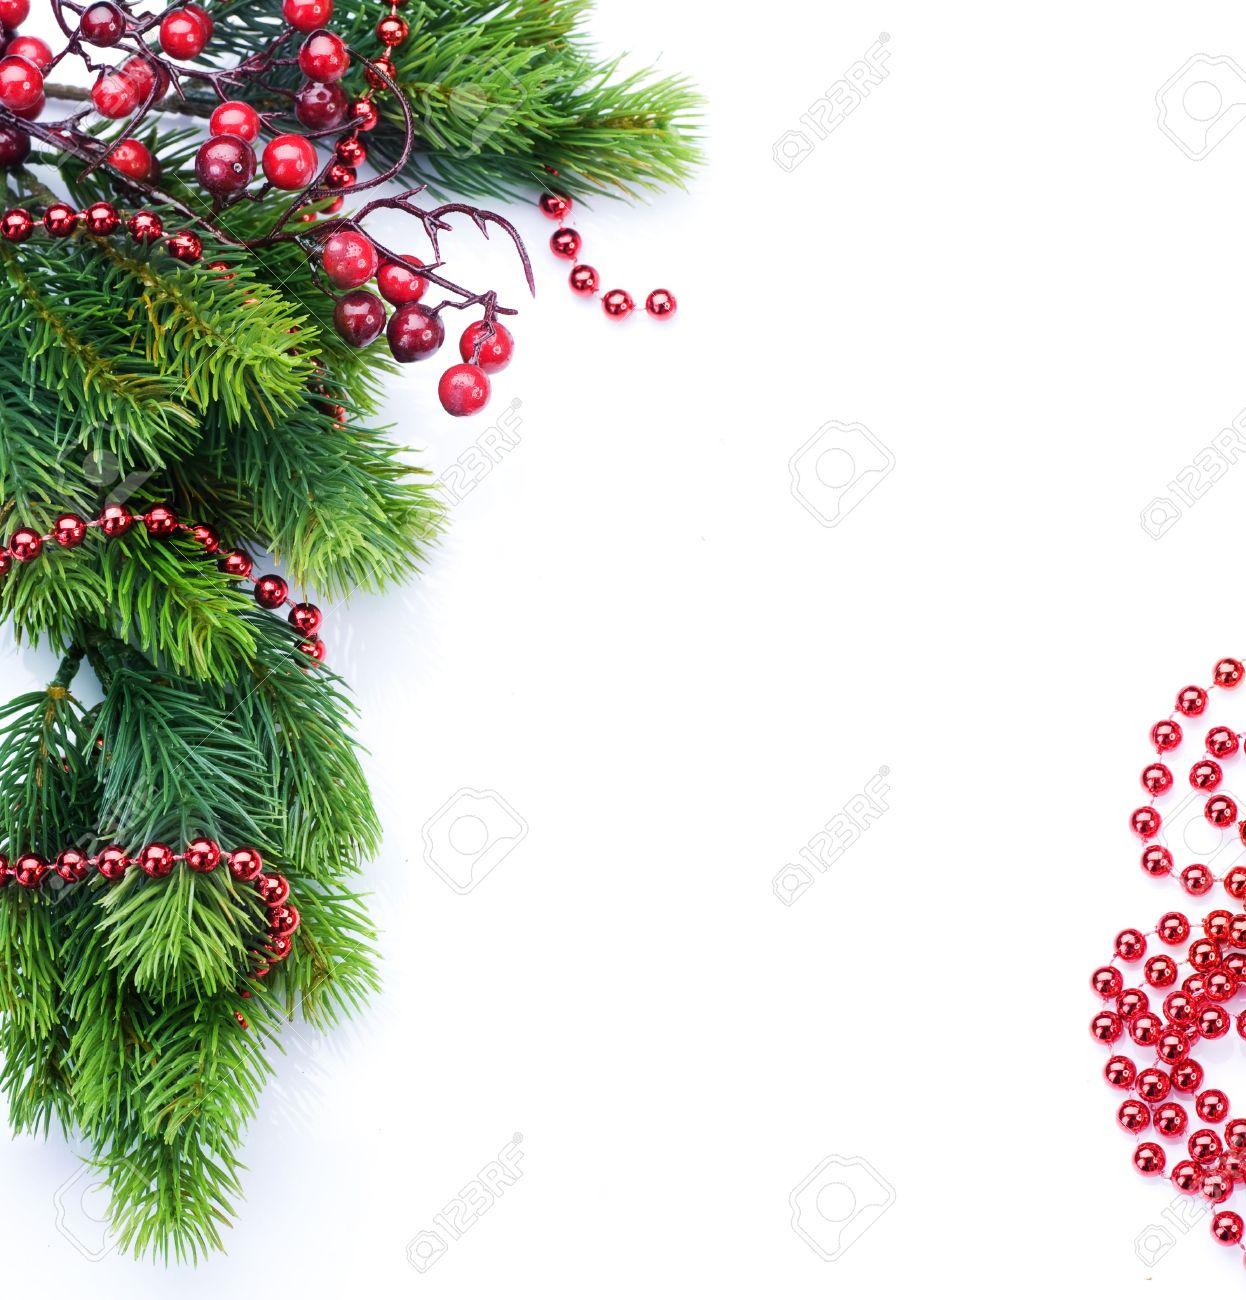 Christmas Border Design.Christmas Decoration Border Design